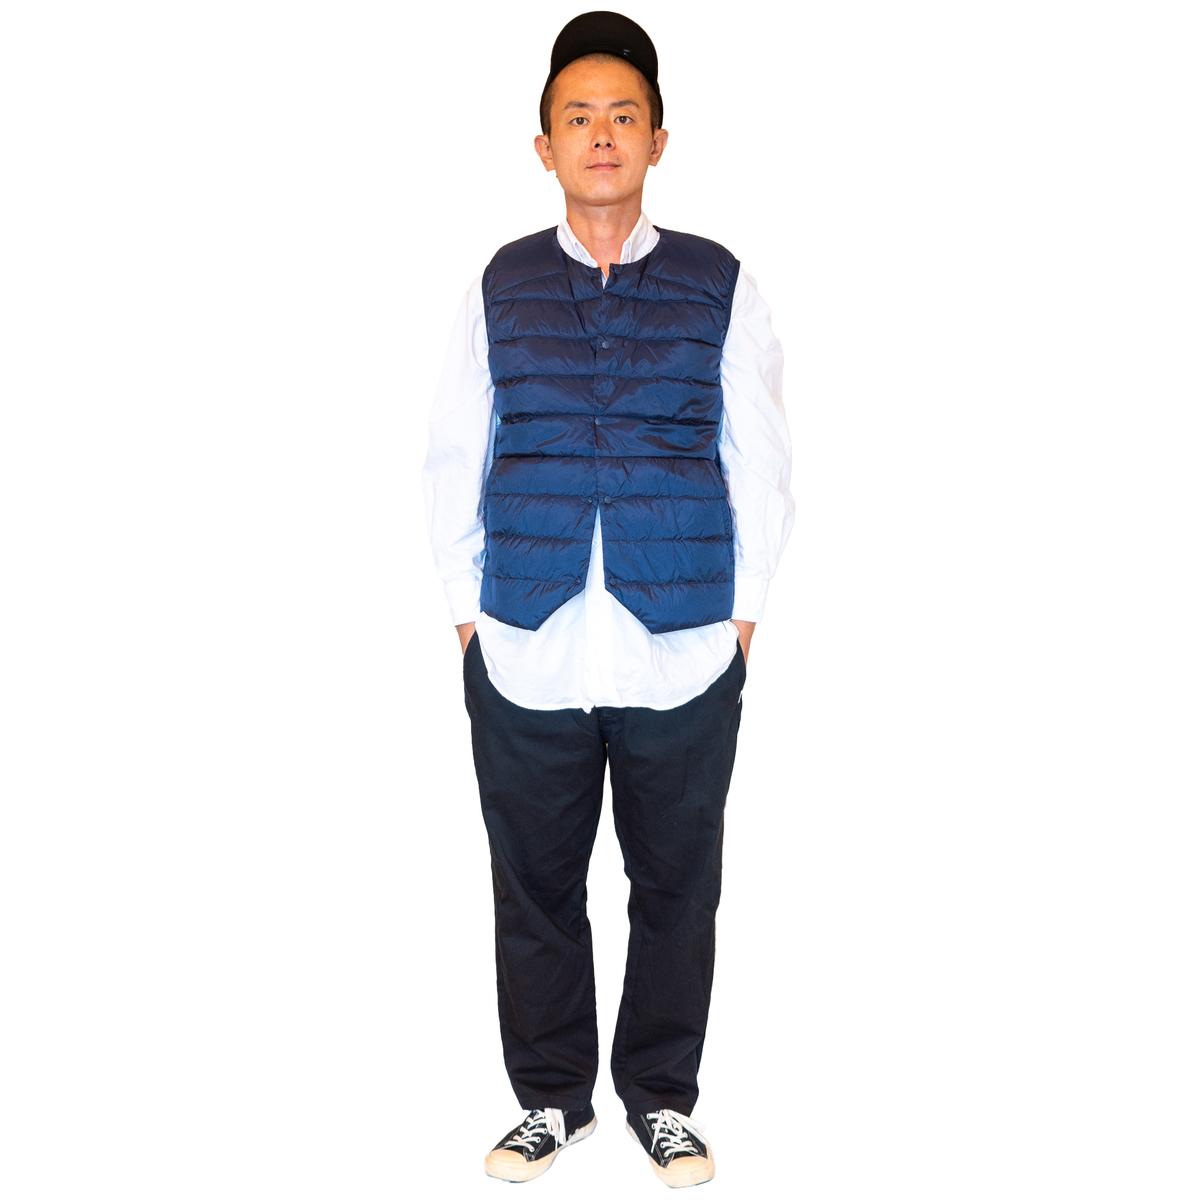 f:id:yamada0221:20210816112745j:plain